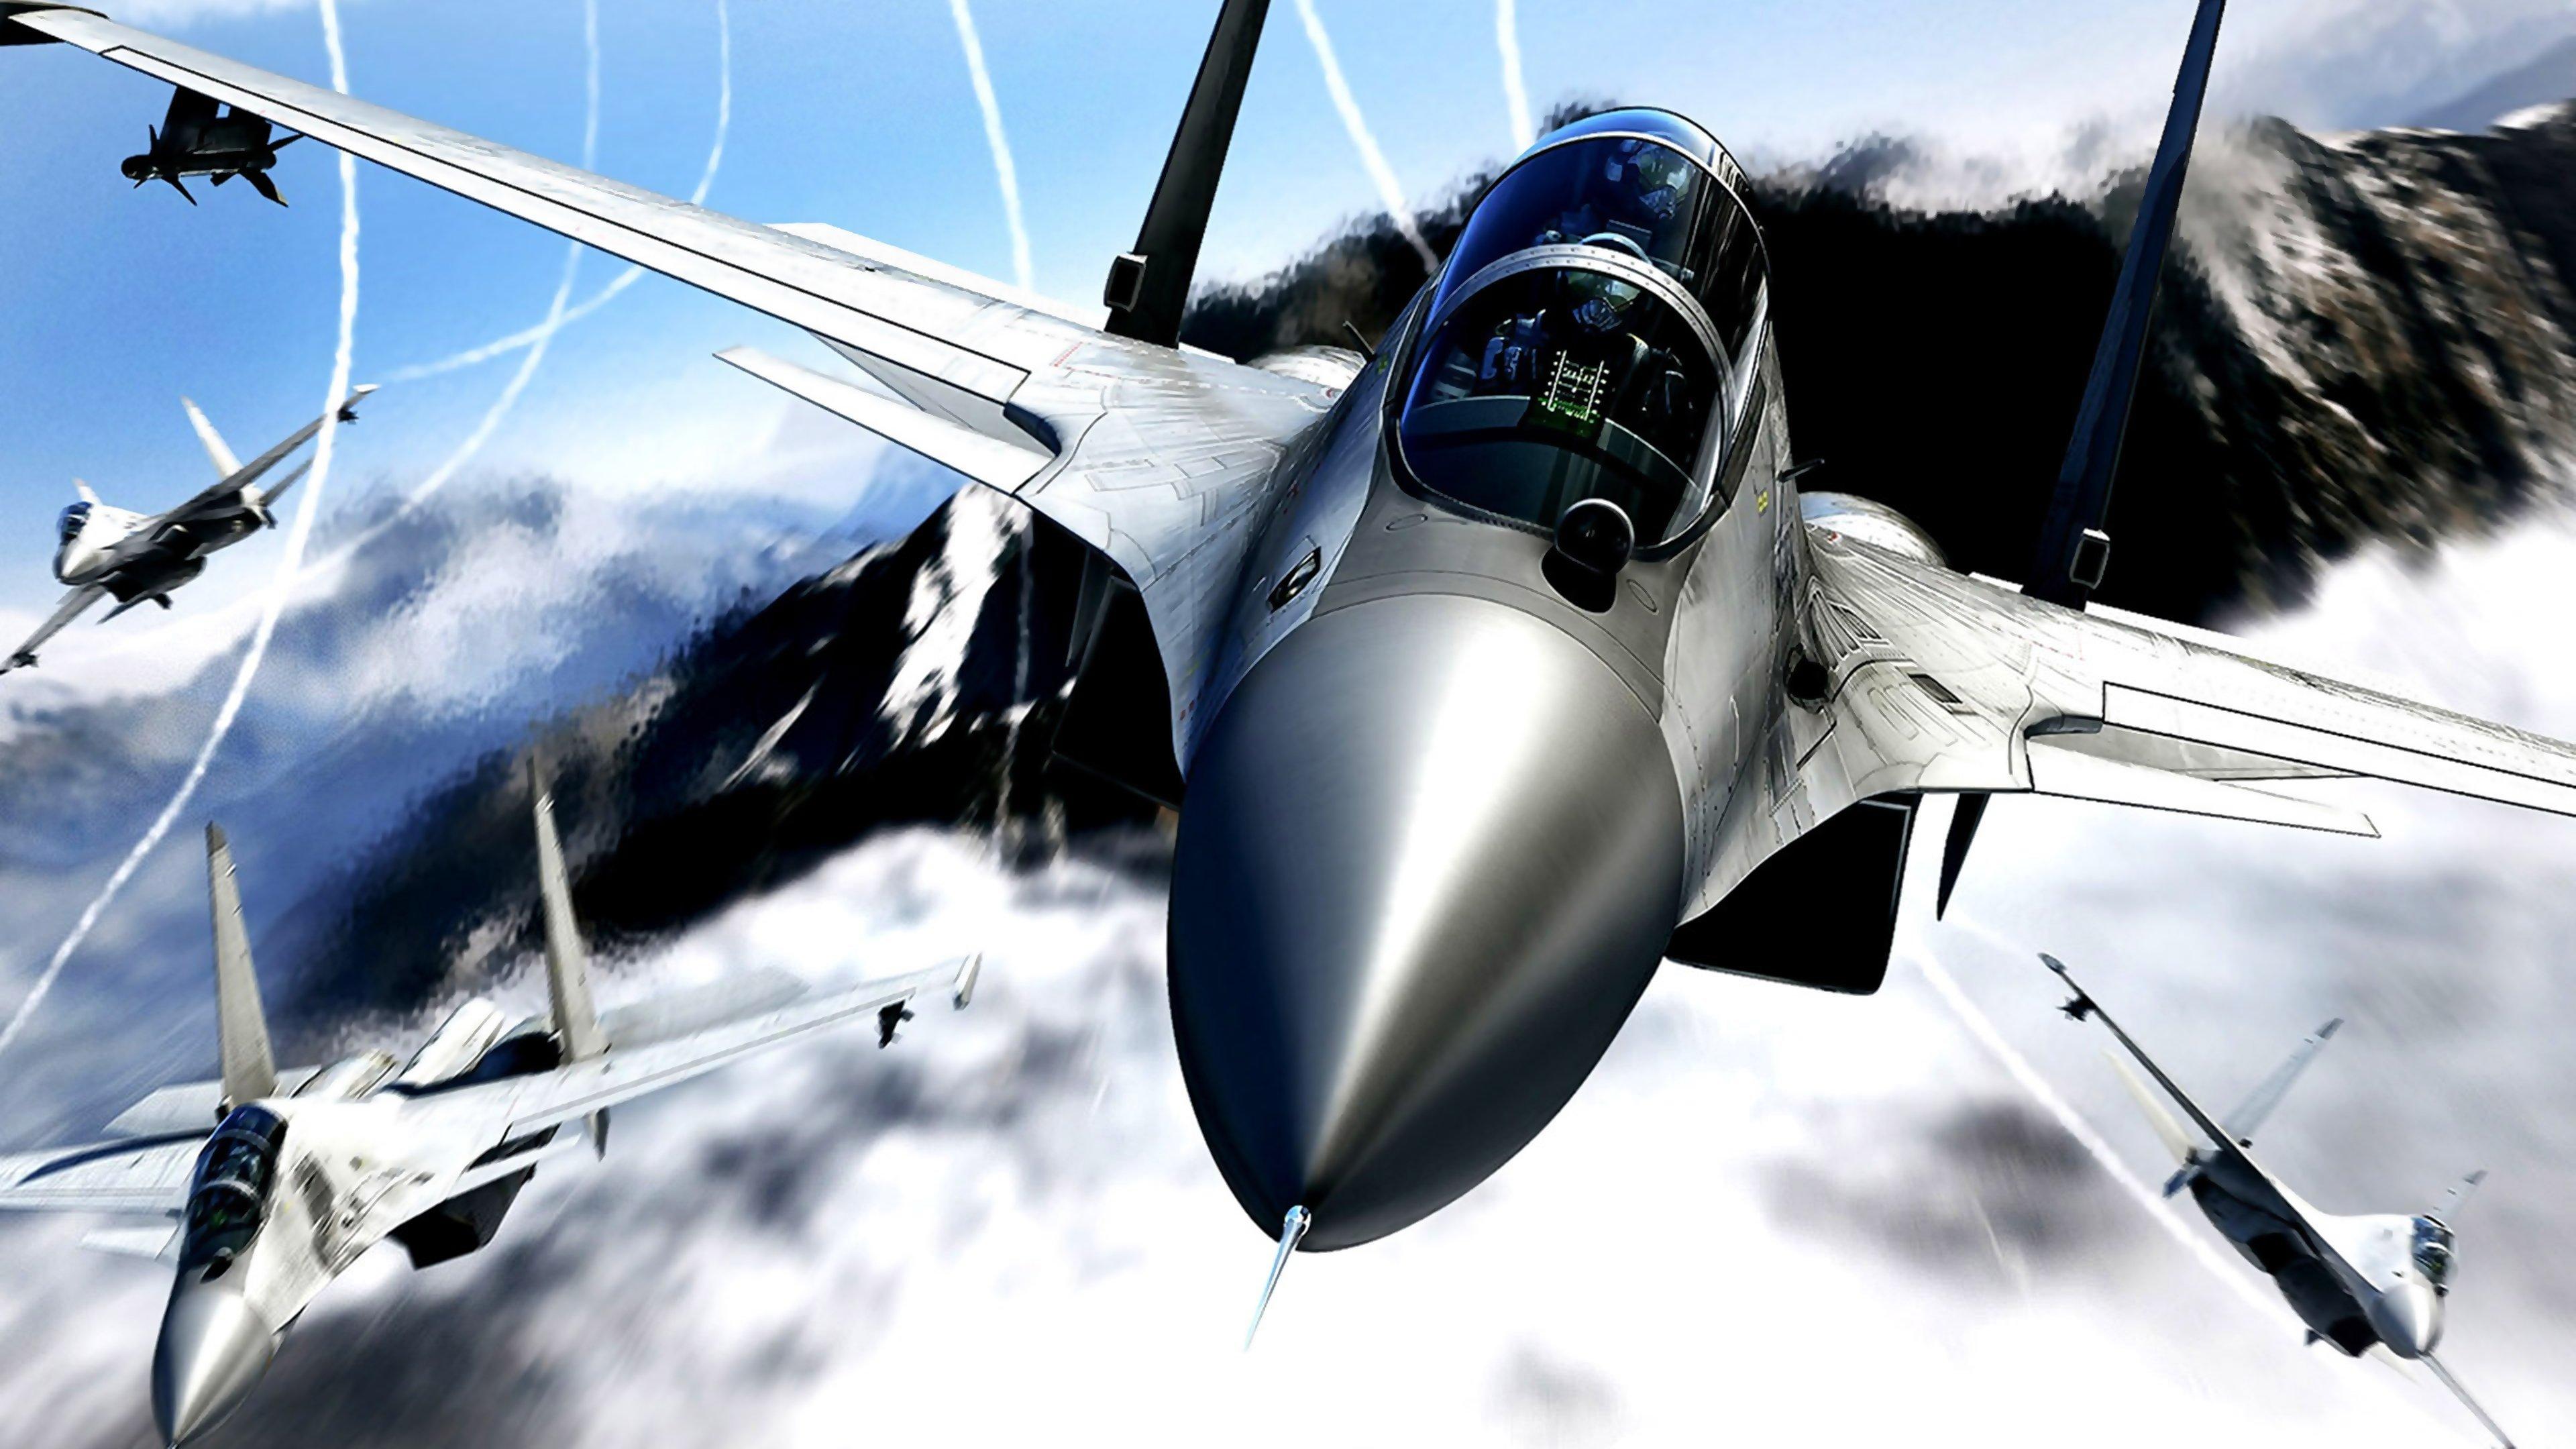 Anti-<b>aircraft</b> Guns On The <b>Battleship</b> | <b>Battleship</b>, Uss north ...